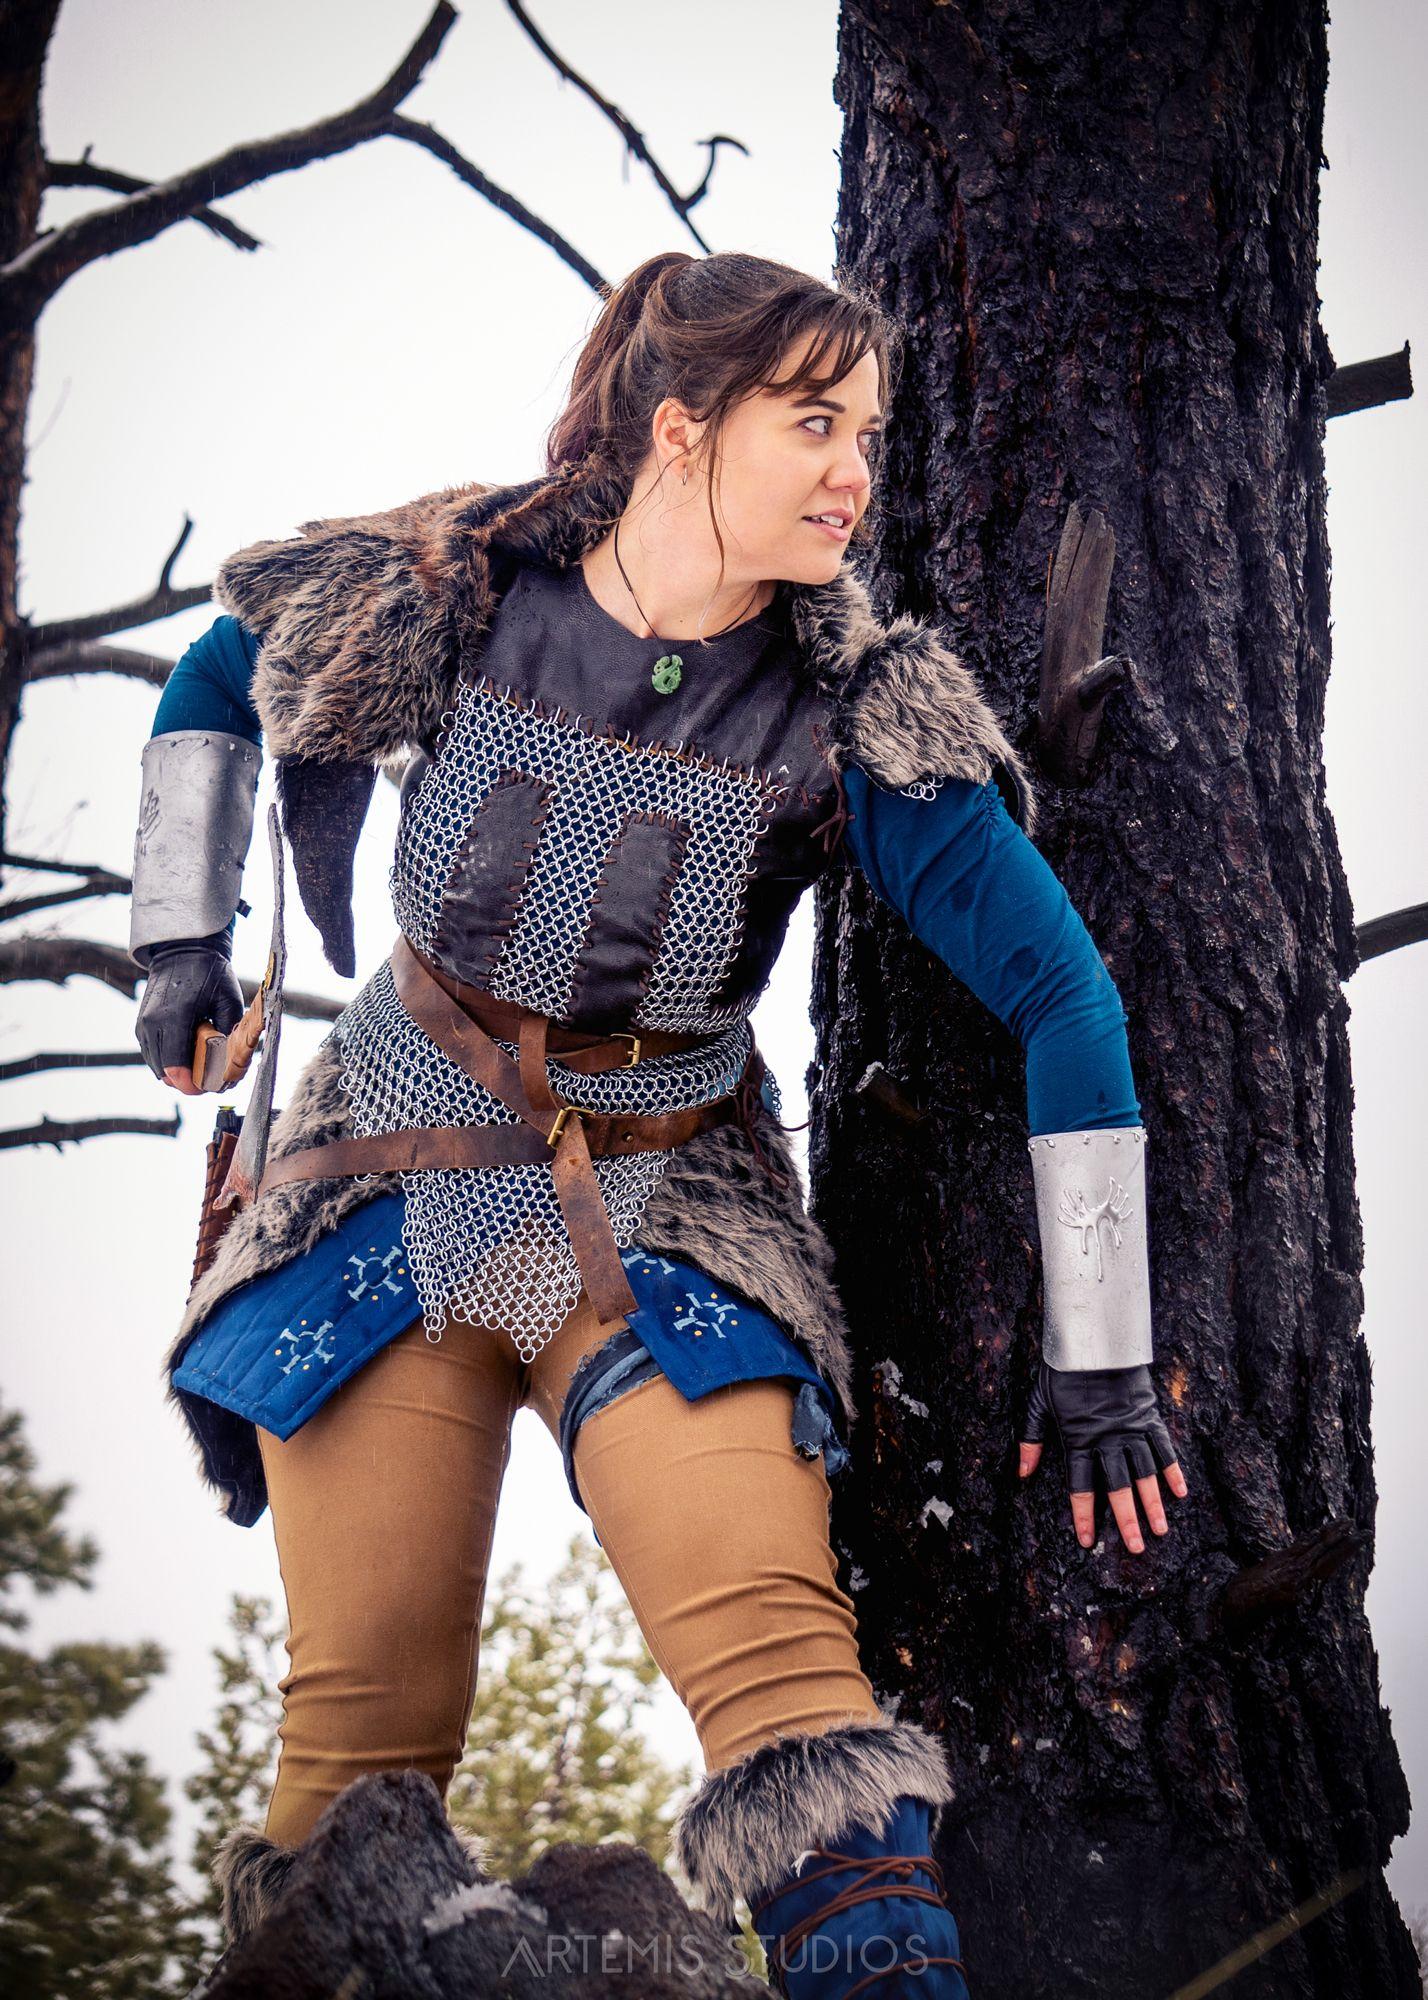 | Lara croft cosplay, Lara croft, Tomb raider cosplay